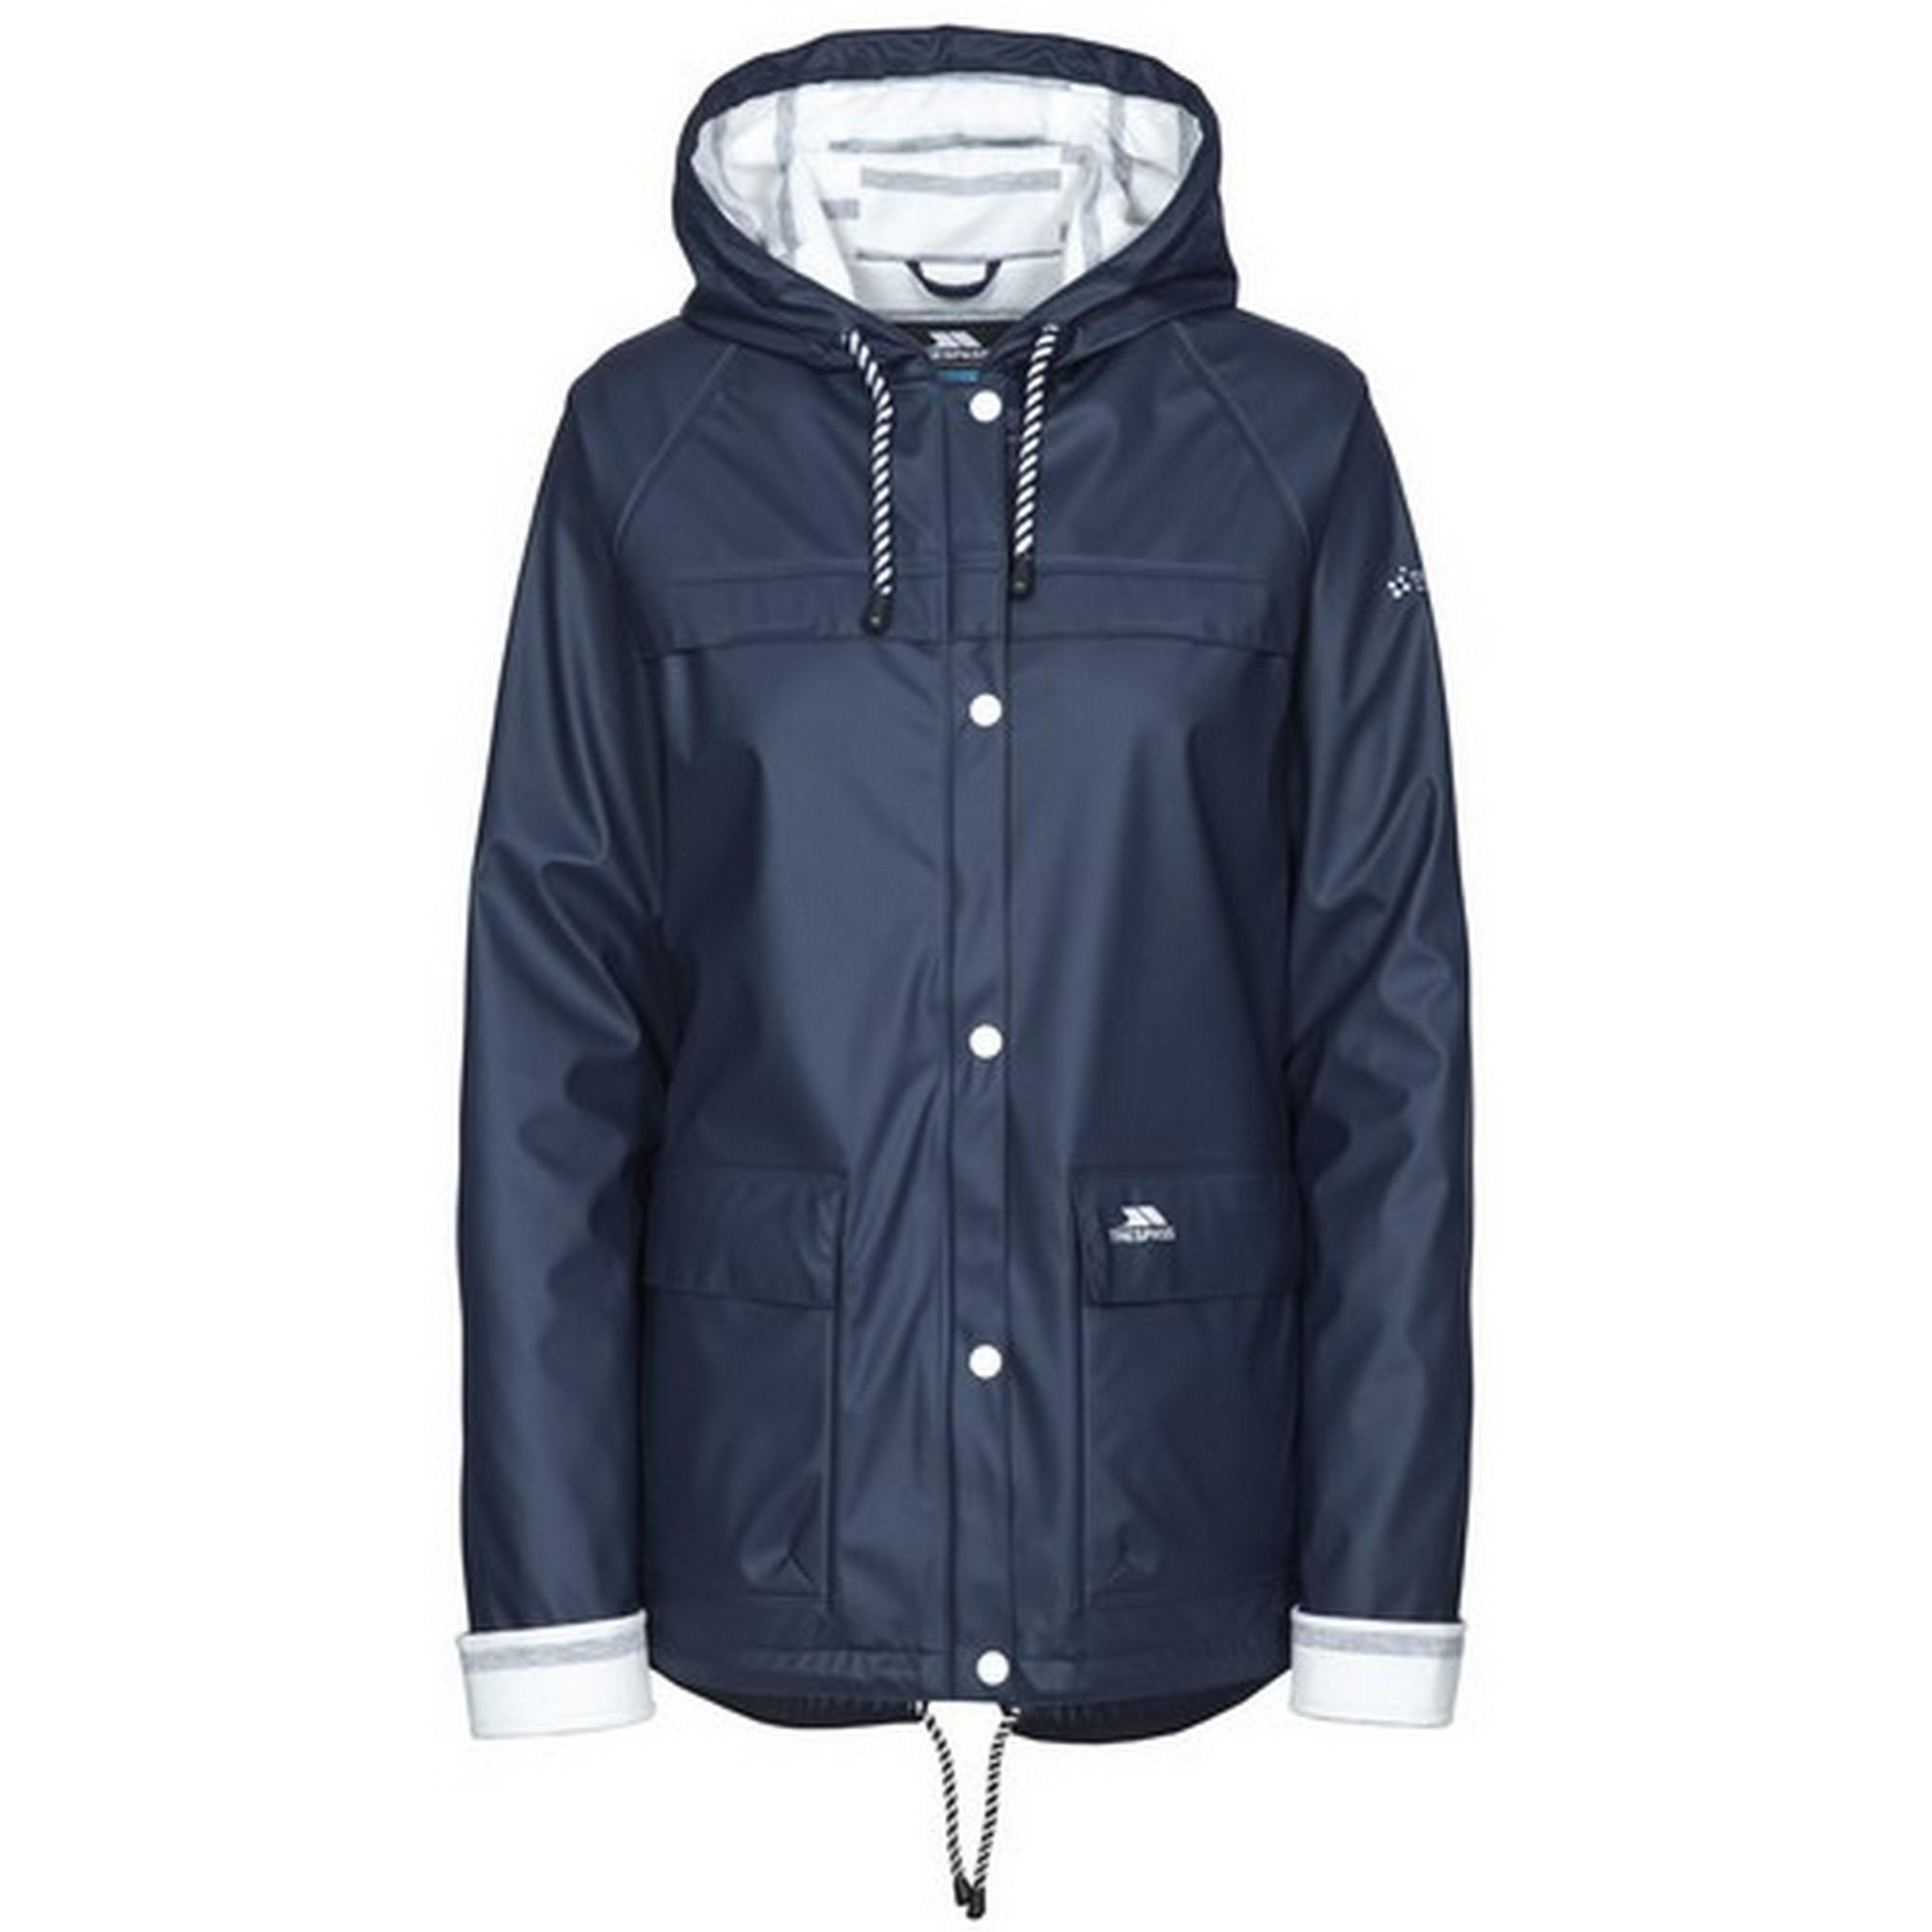 Trespass-Womens-Ladies-Muddle-Waterproof-Jacket-TP3991 thumbnail 7